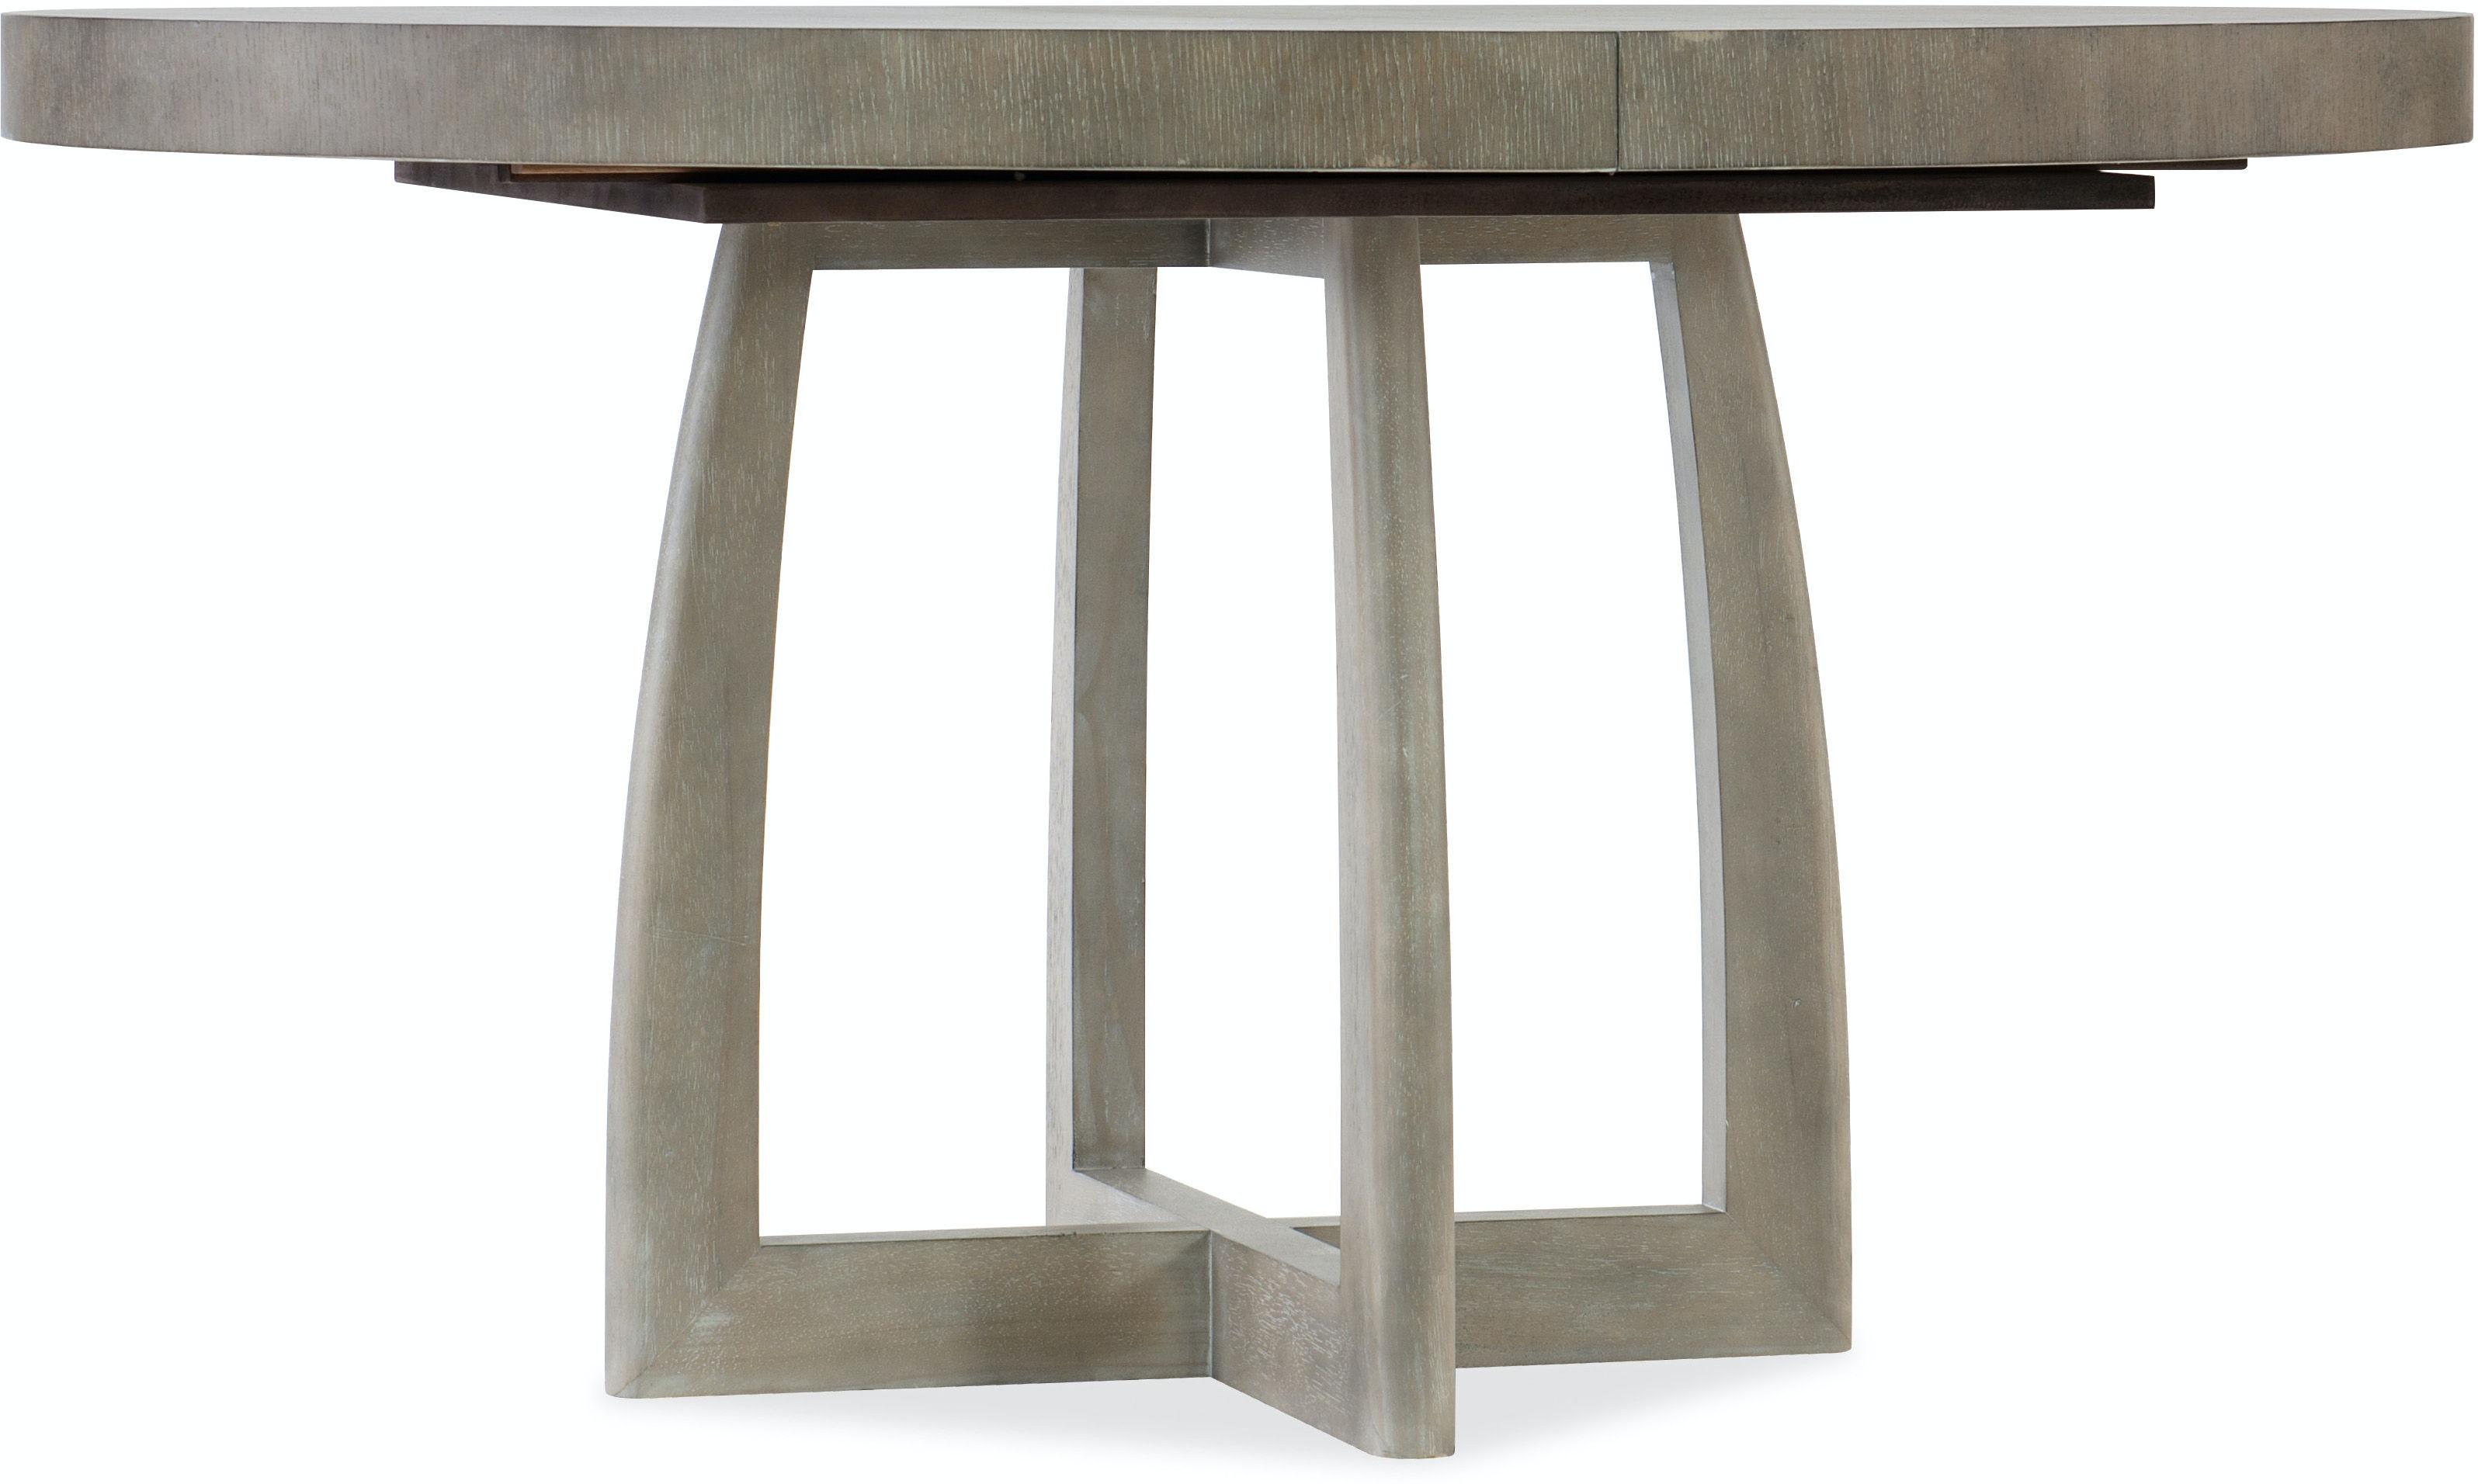 pedestal dining room table with leaf | Hooker Furniture Dining Room Affinity 48in Round Pedestal ...